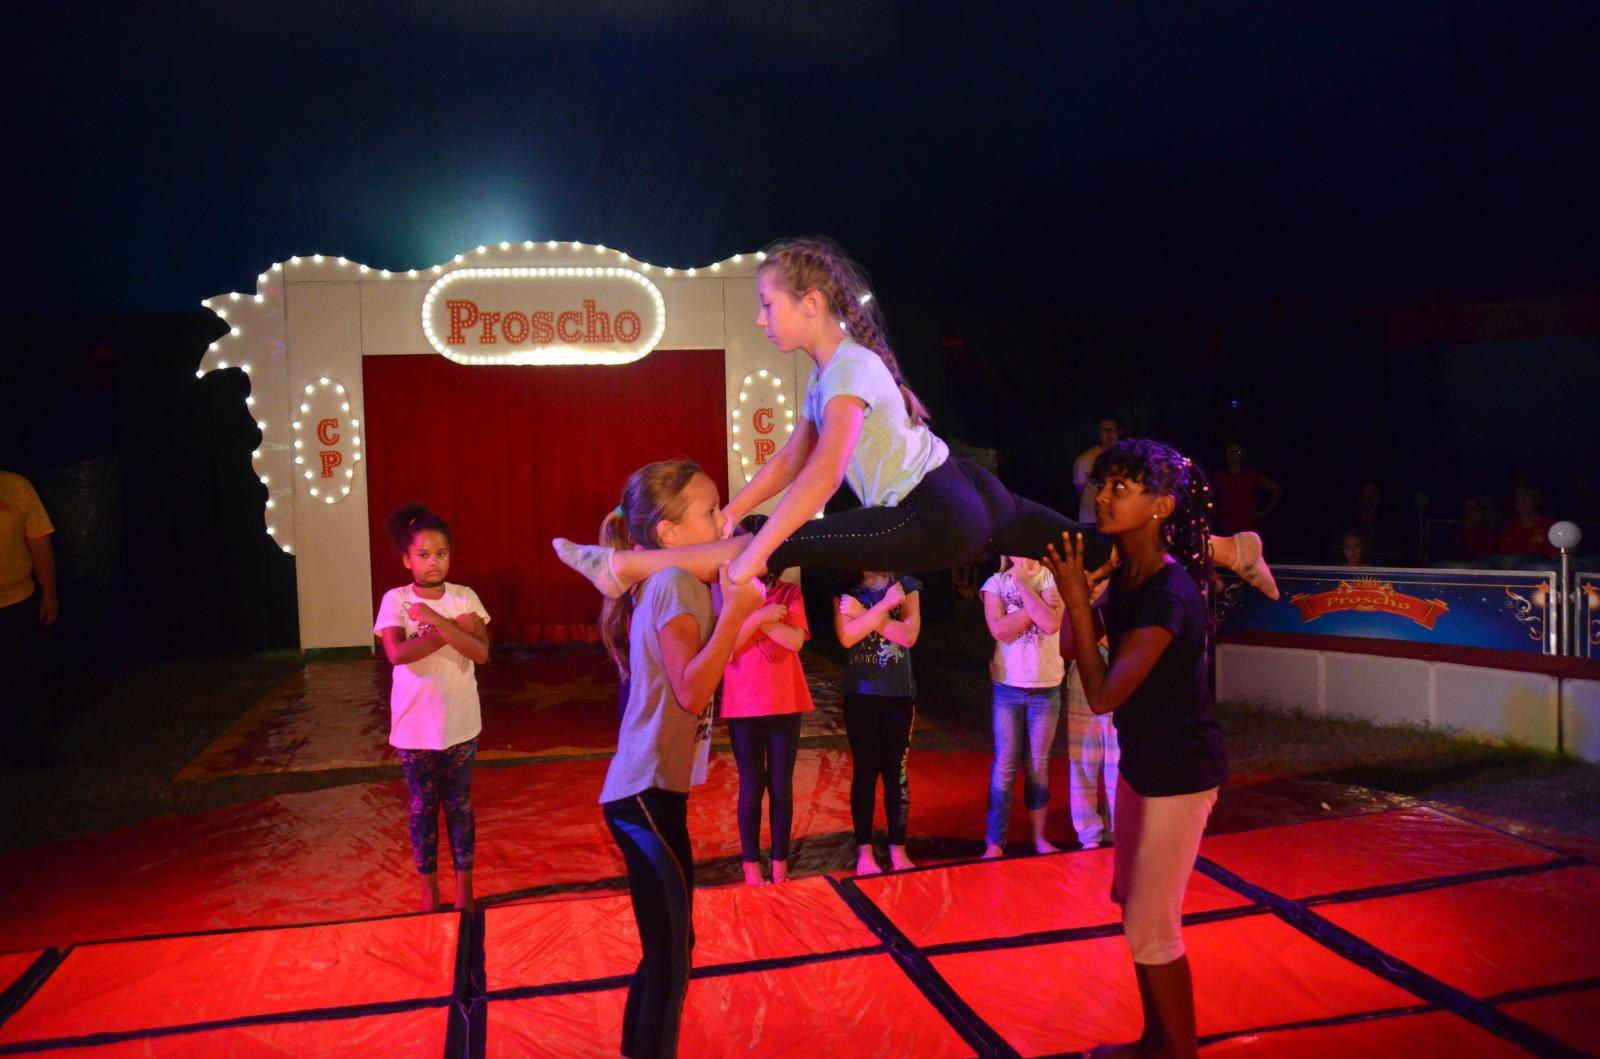 SummerTent-JKJ2021-Jugendkultursommer-zirkus